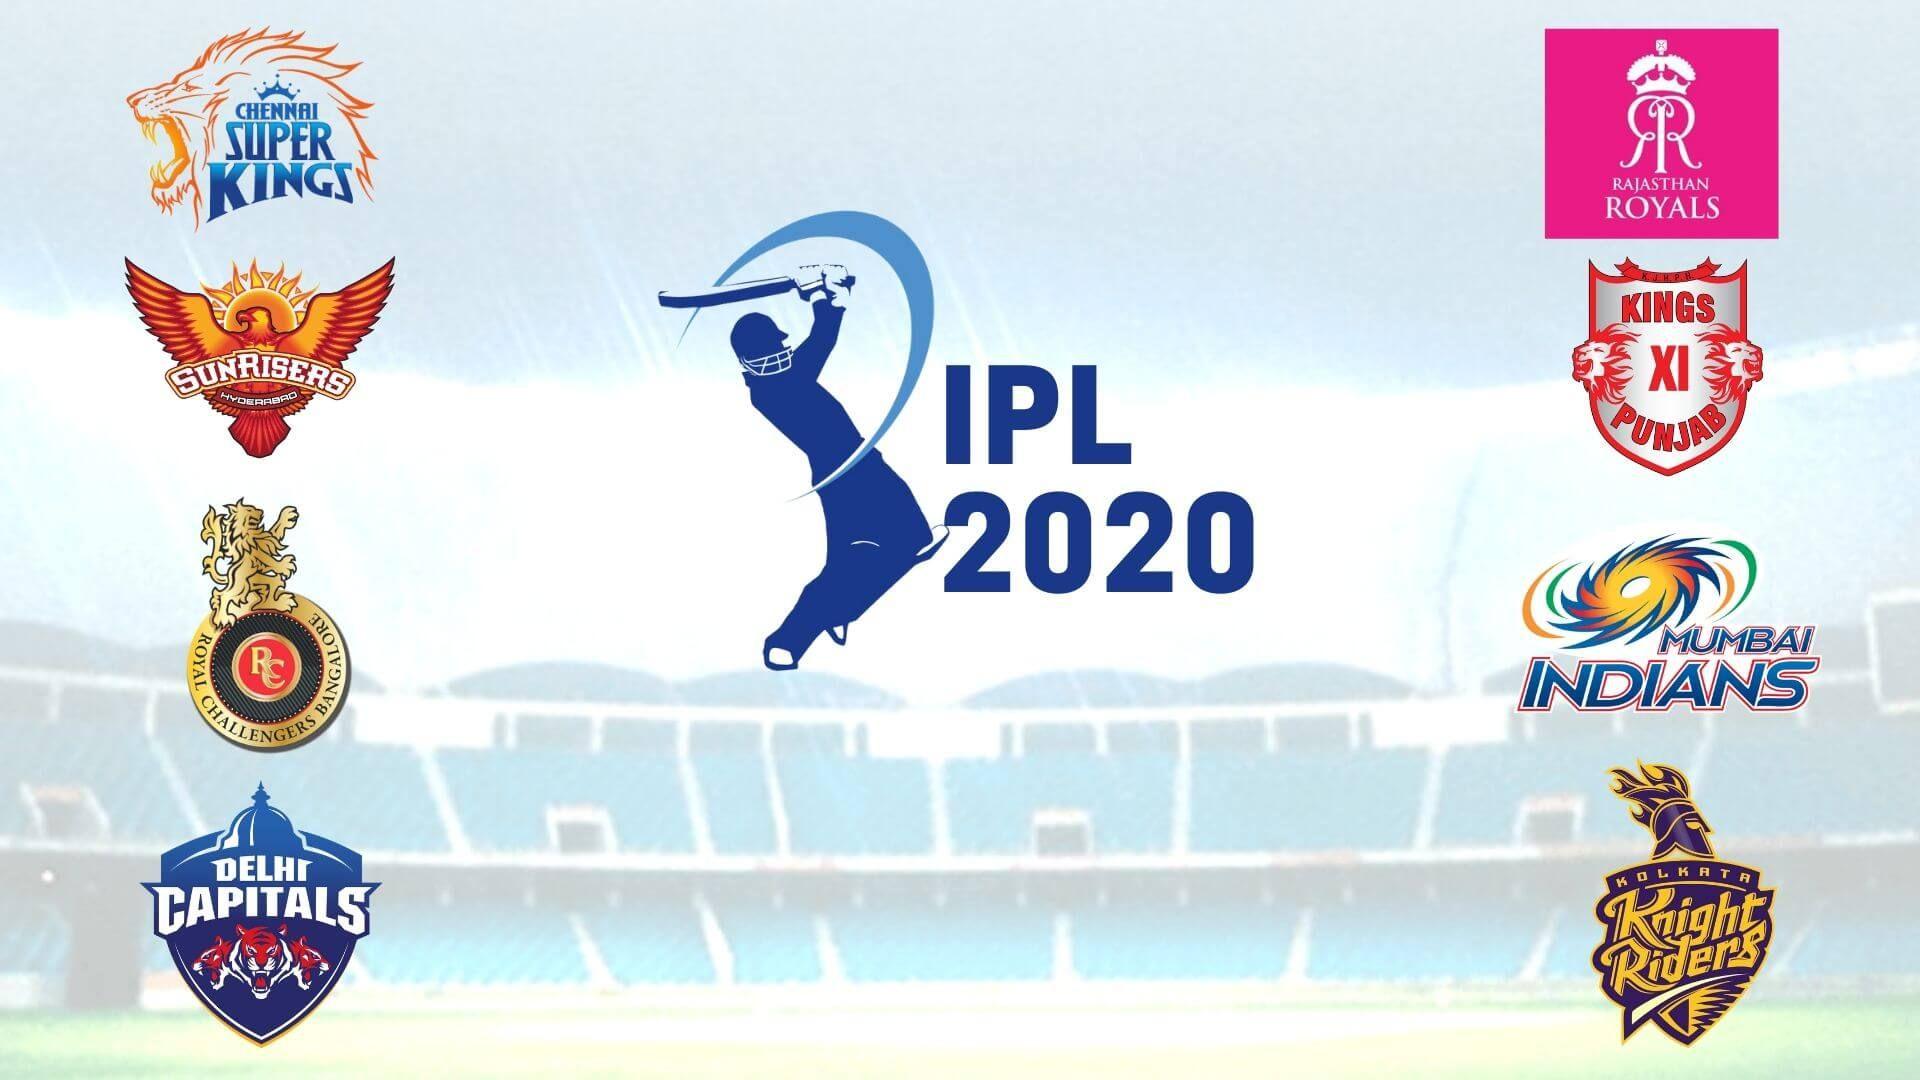 Buy Ipl 2020 Tickets Booking Online 8211 Ipl Ticket Price Date Teams Squad In 2020 Ipl Premier League Cricket In India